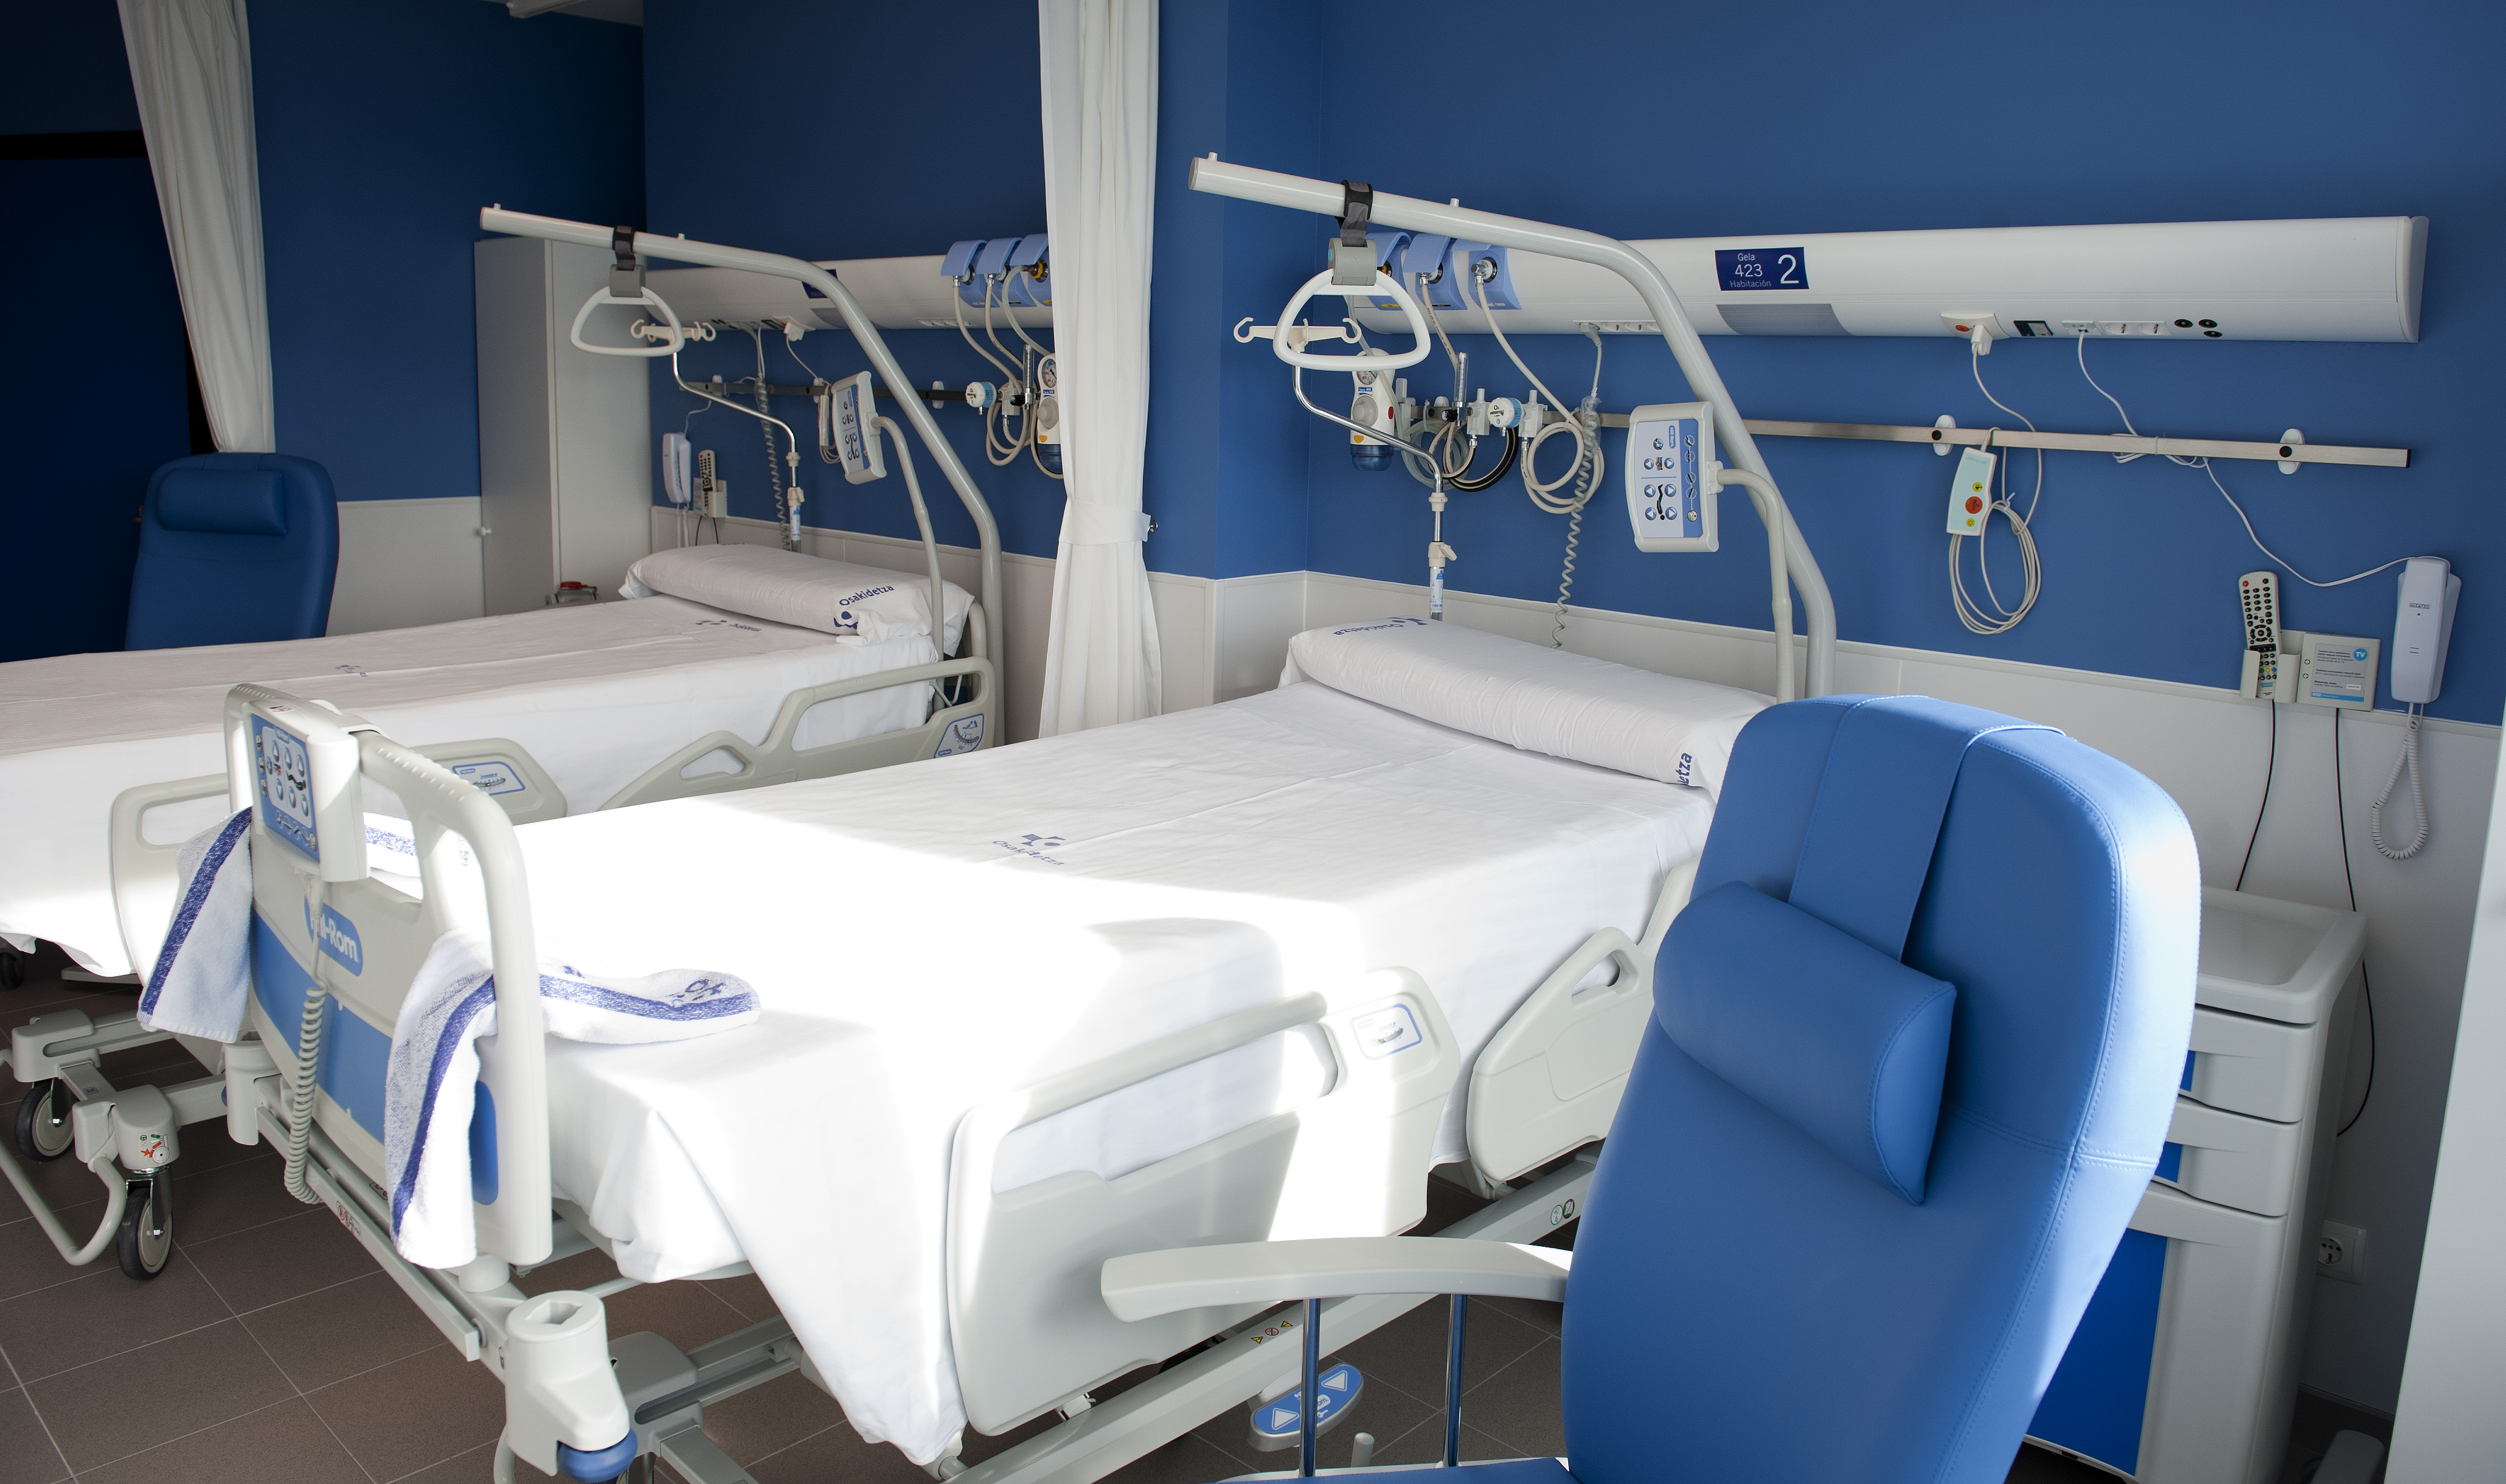 2012_11_09_bengoa_hospital_santa_marina_04.jpg